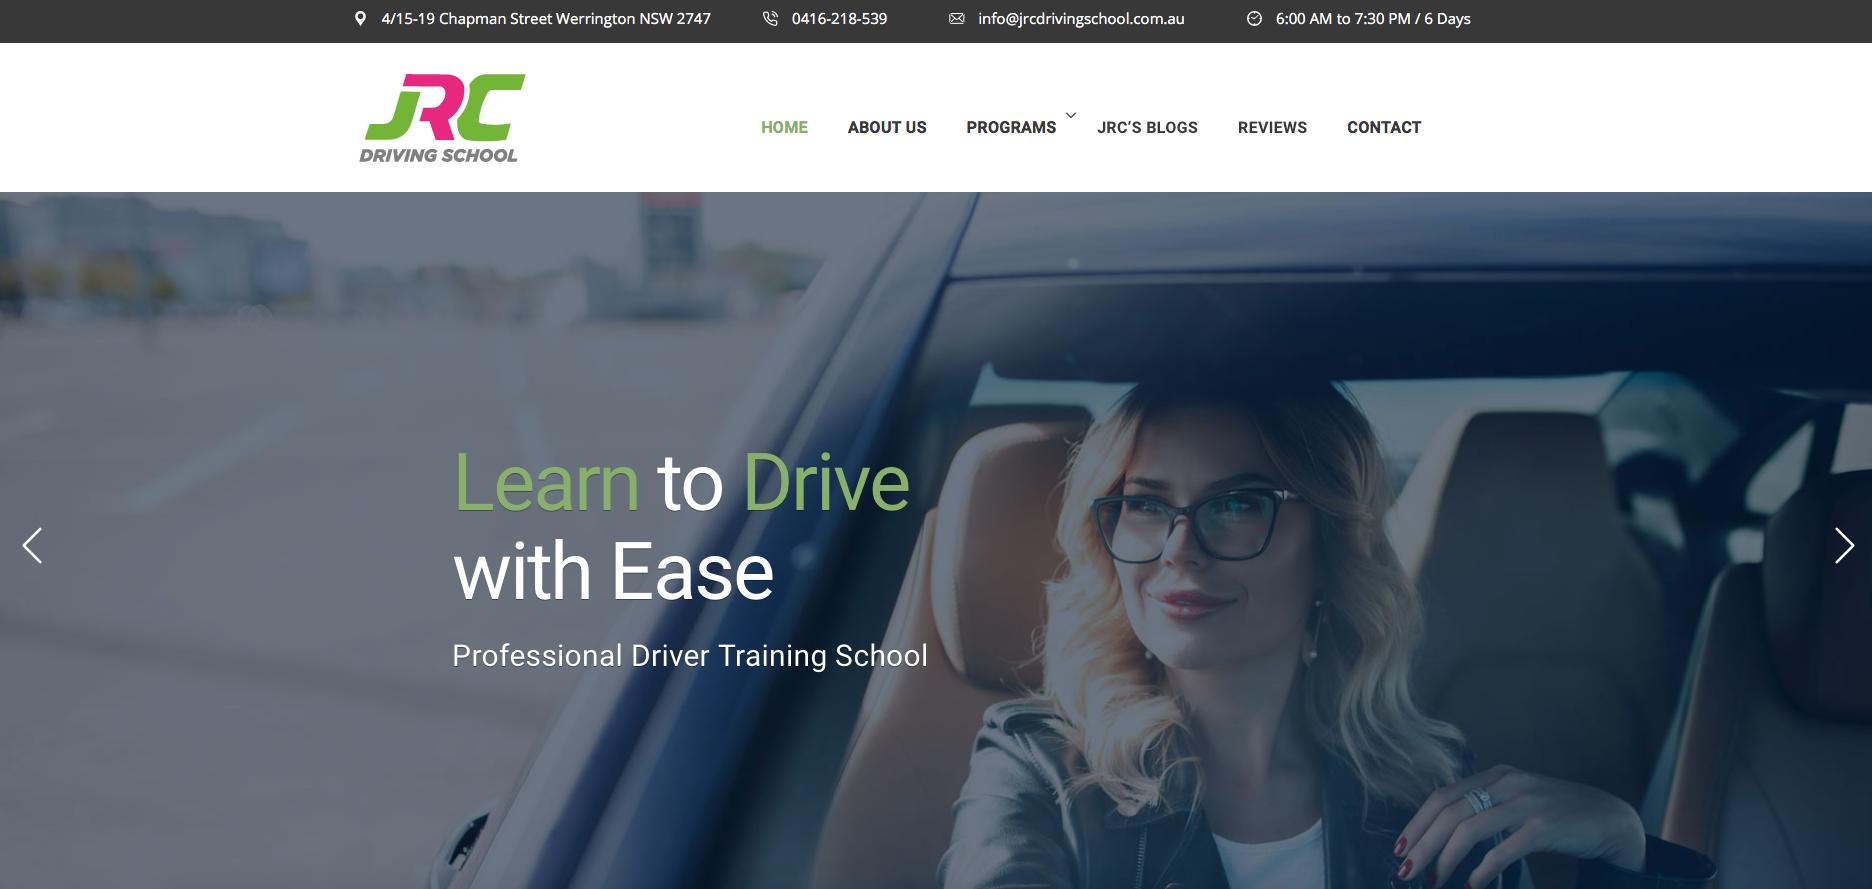 Business website sample - JRC Driving School